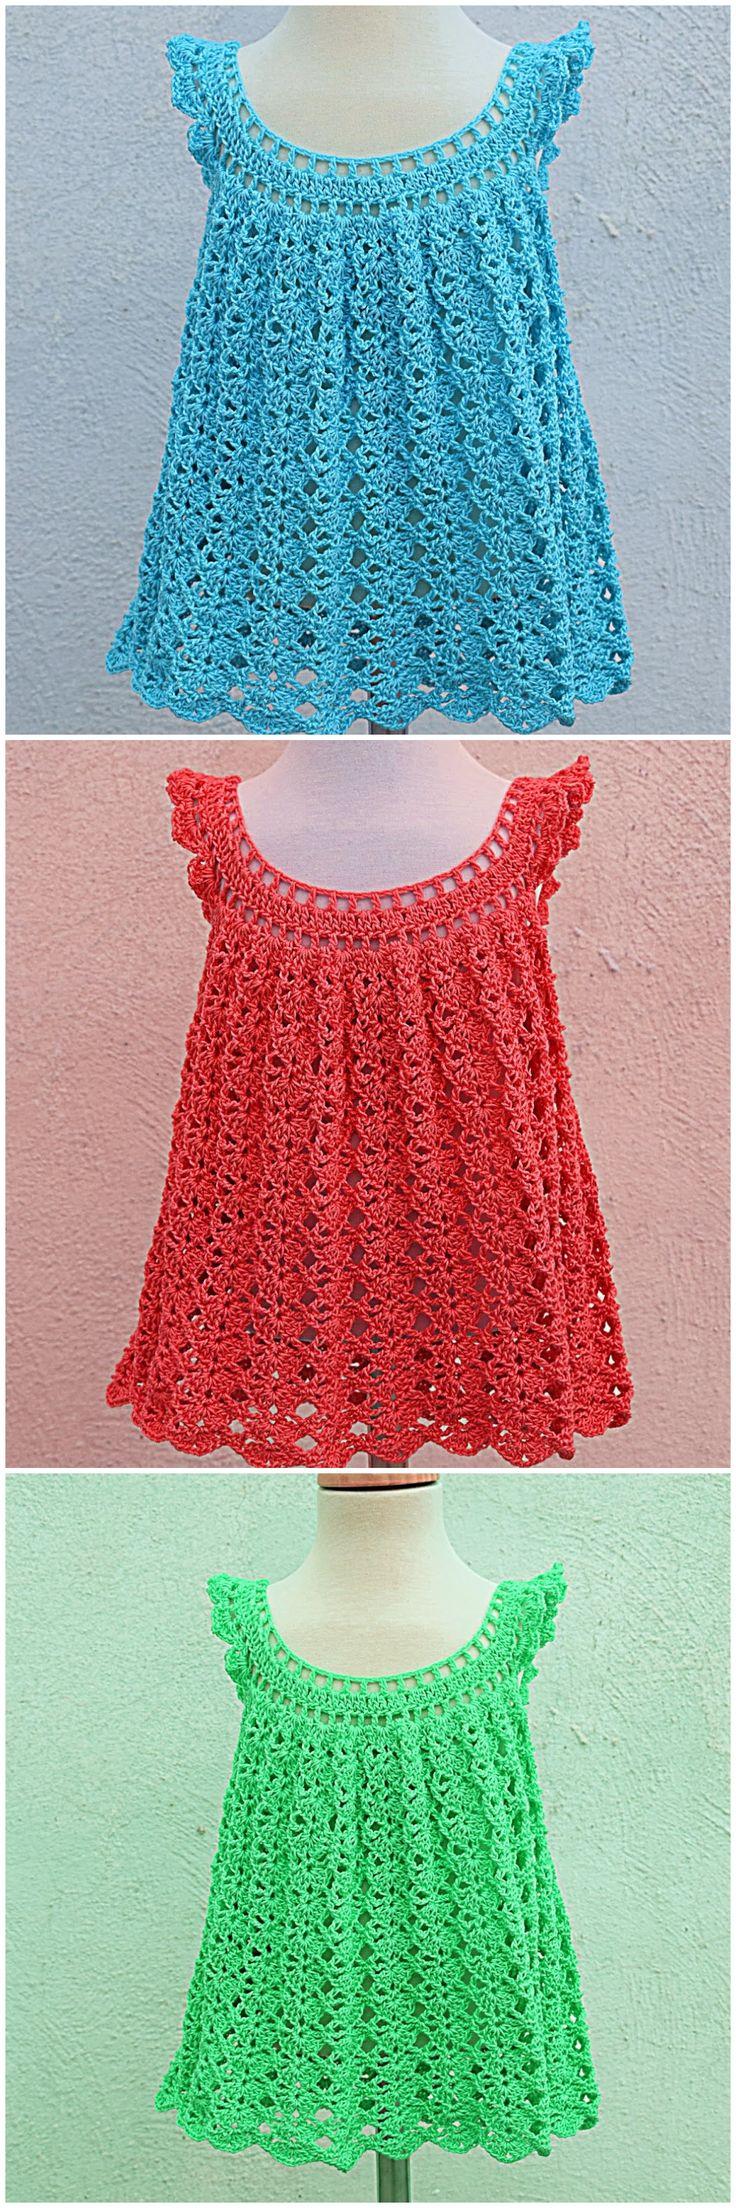 Crochet Fast And Easy Baby Girl Dress For Summer 2